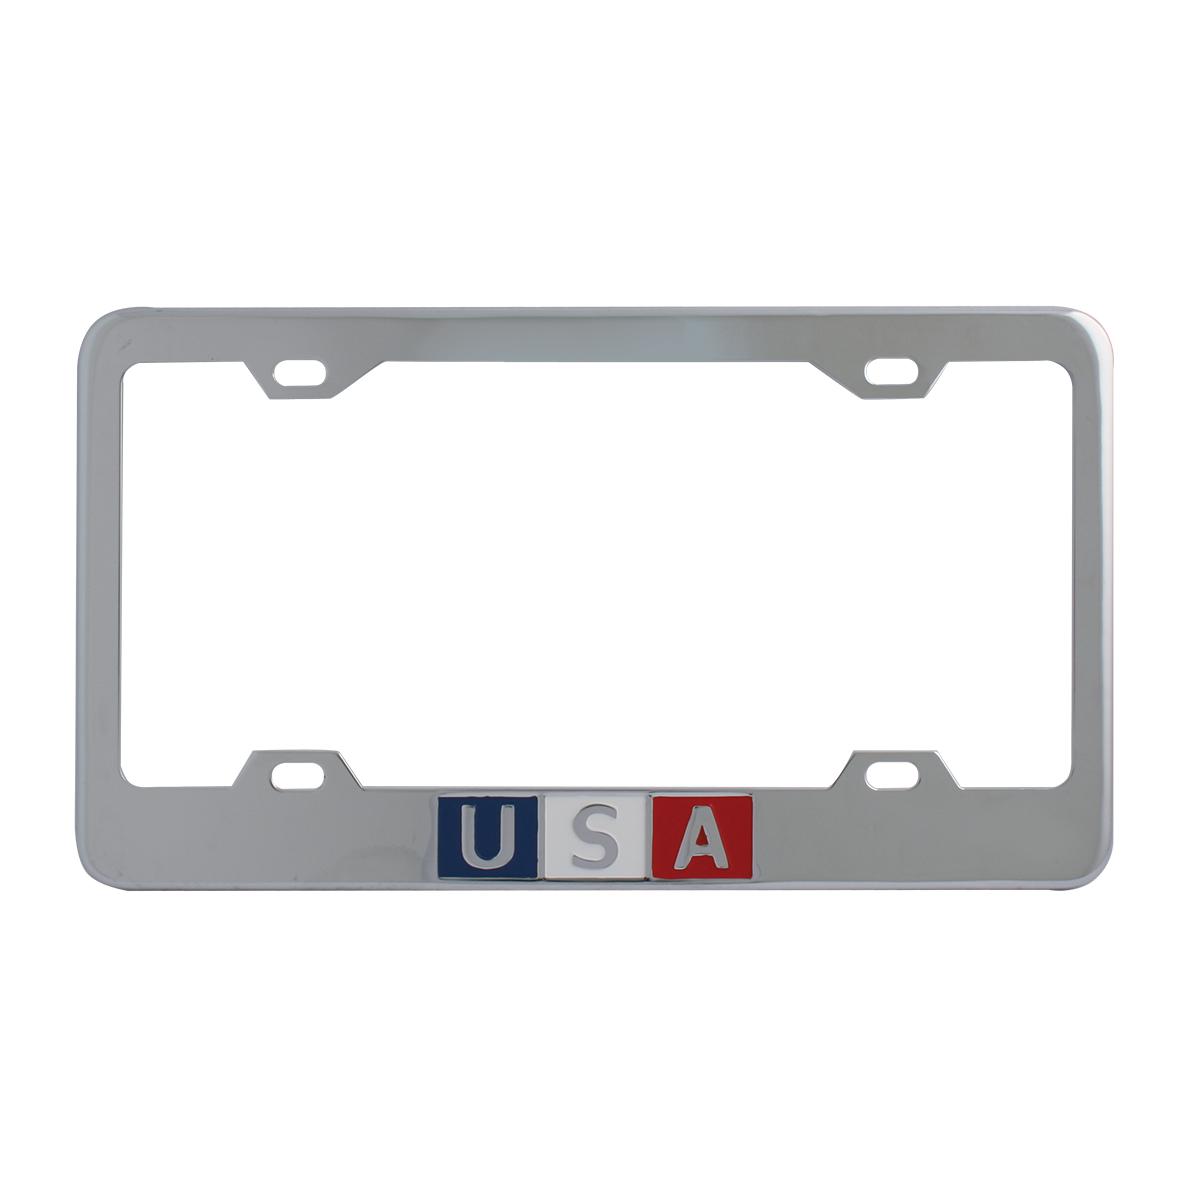 Chrome Plated Steel USA License Plate Frame - 4 Holes